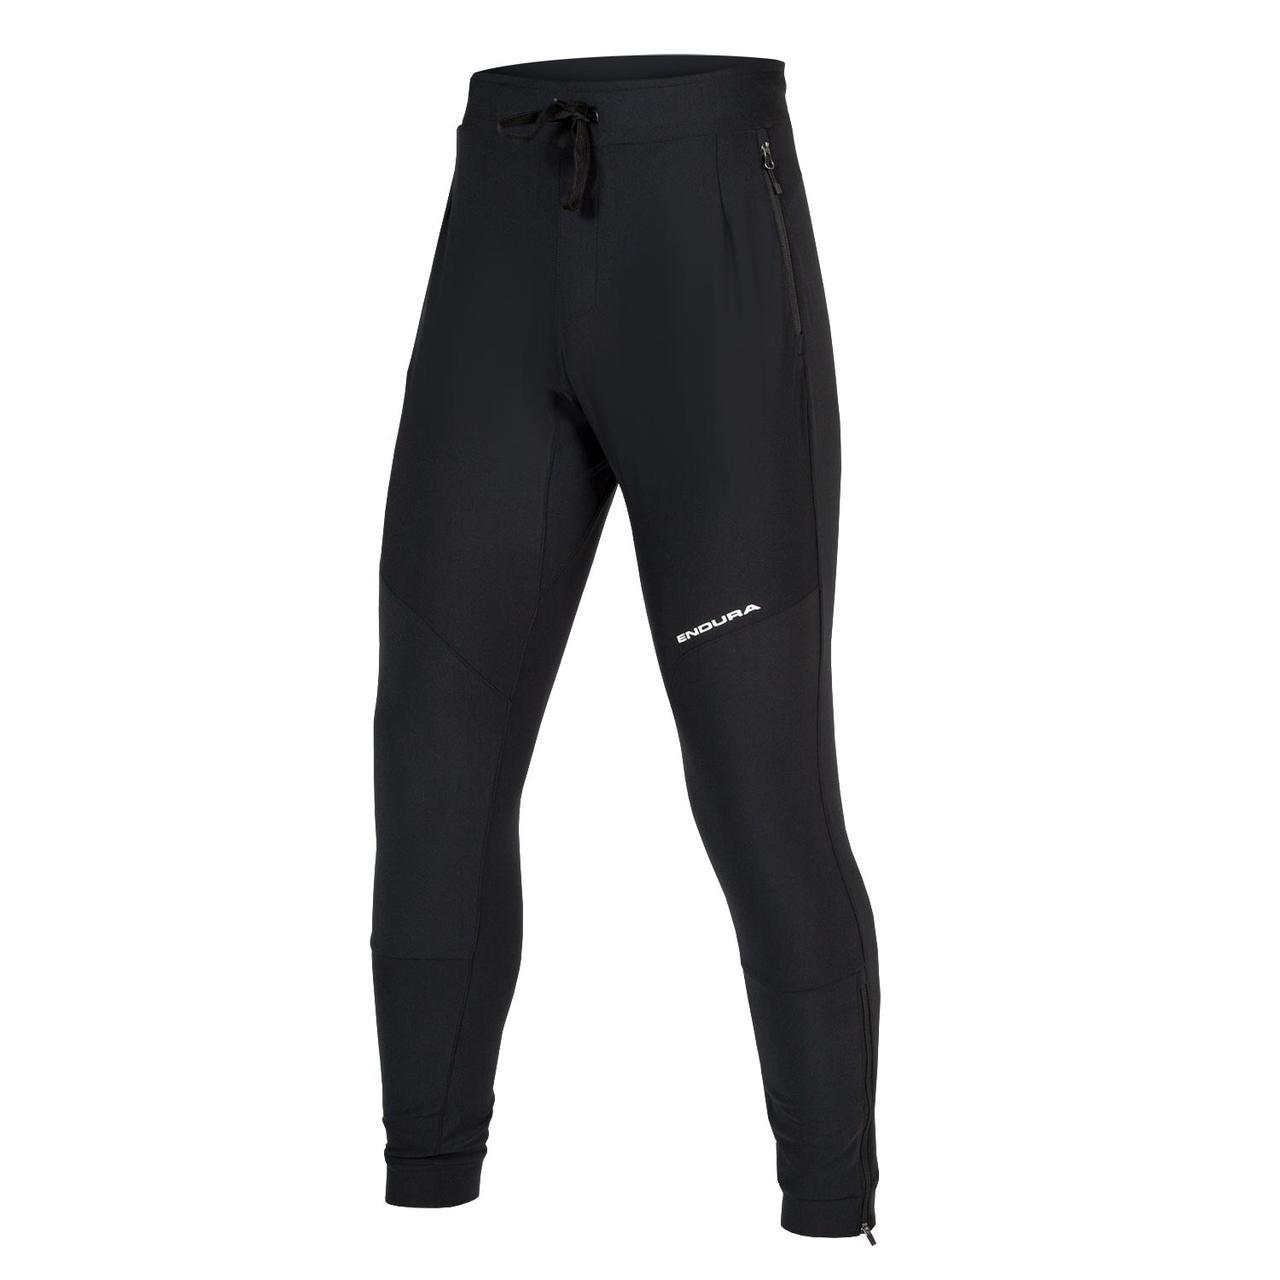 Endura  брюки мужские SingleTrack Sports